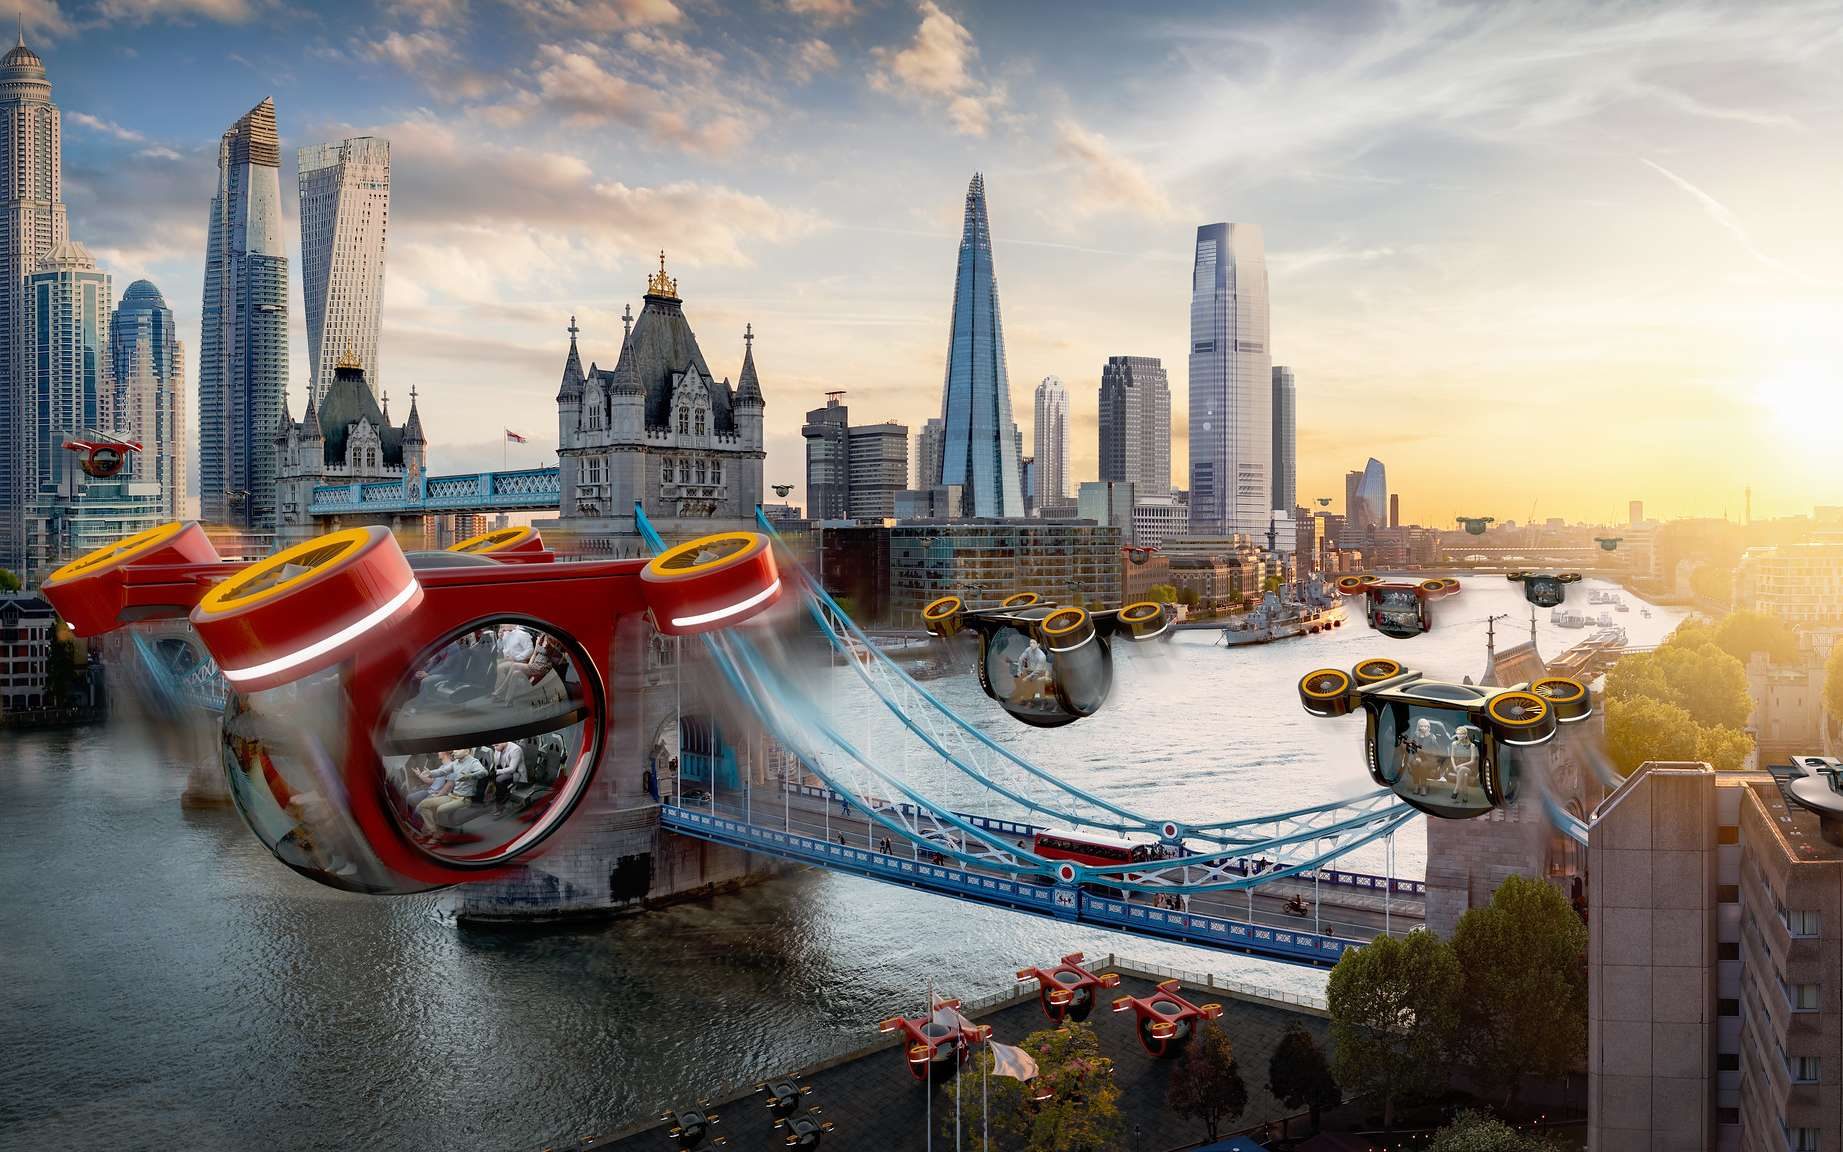 En 2069, le drone-taxi sera un mode de transport courant. © Samsung KX50 report